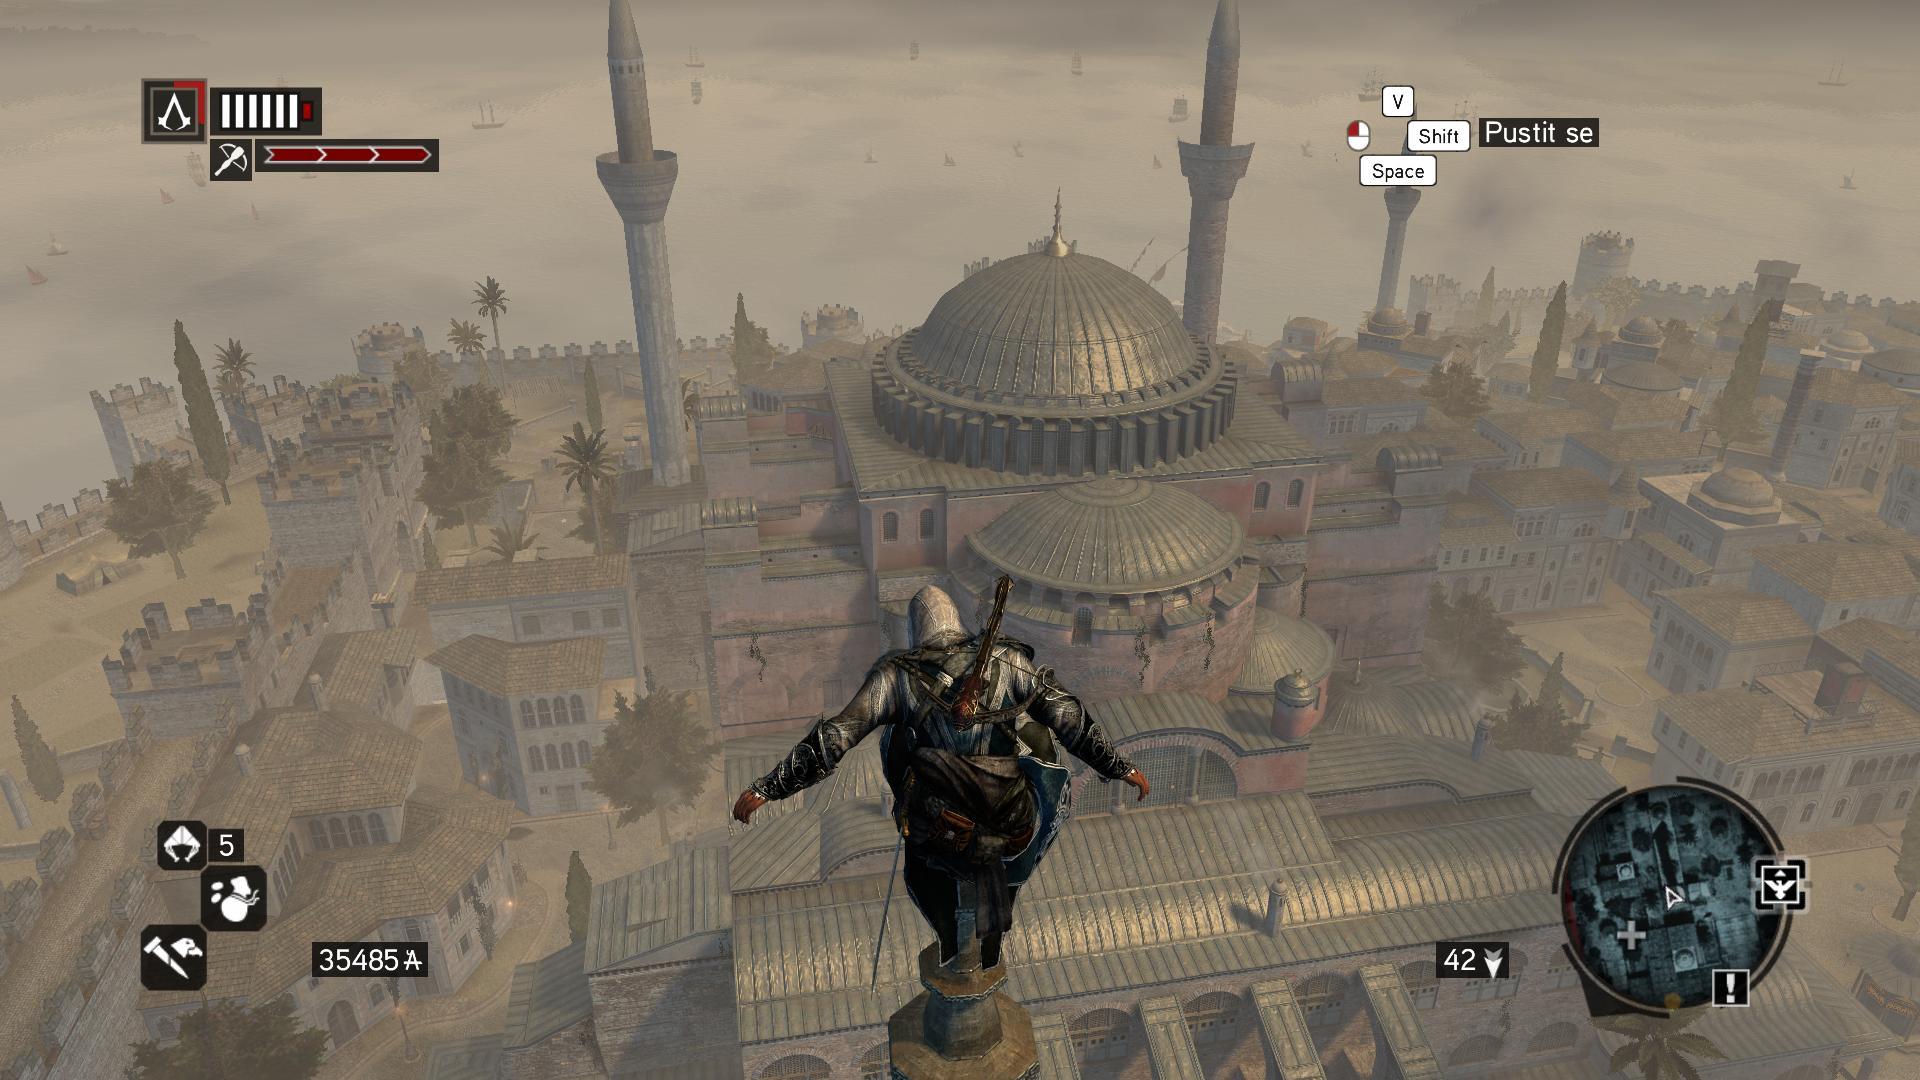 Assassins Creed Revelations + pohled na sérii jako celek 4635